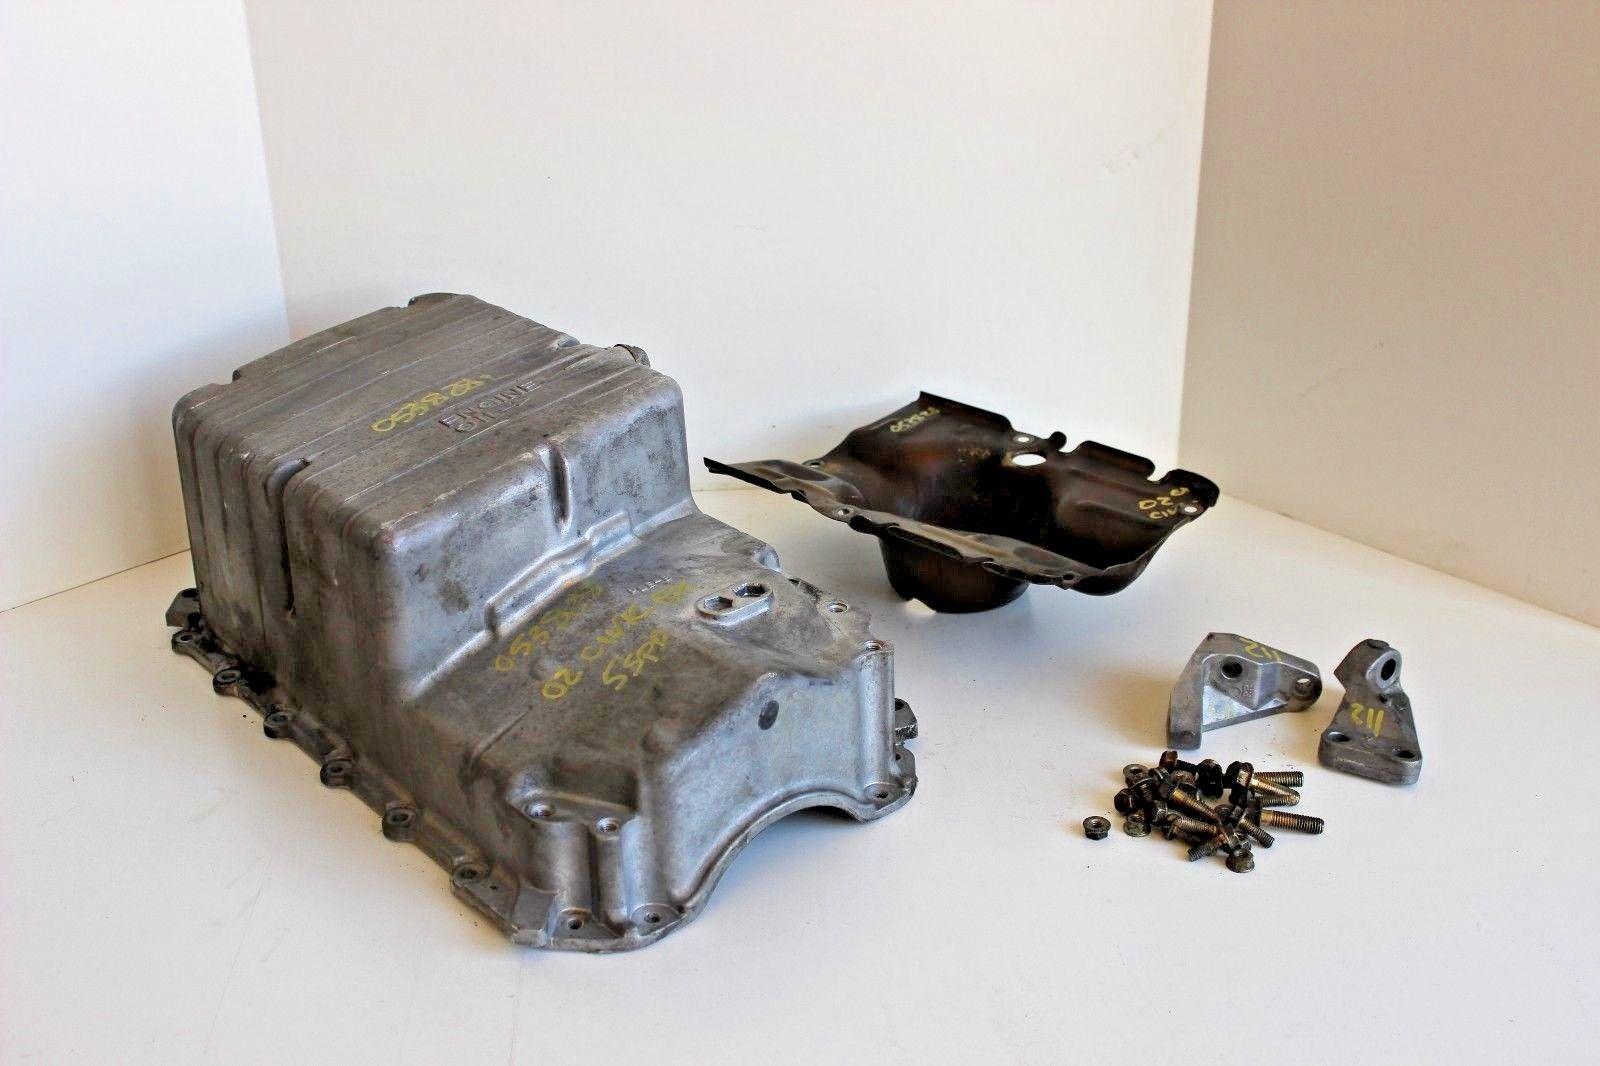 2001-2005 Honda Civic VTEC D17A2 Aluminum Oil Pan Oilpan with Hardware OEM